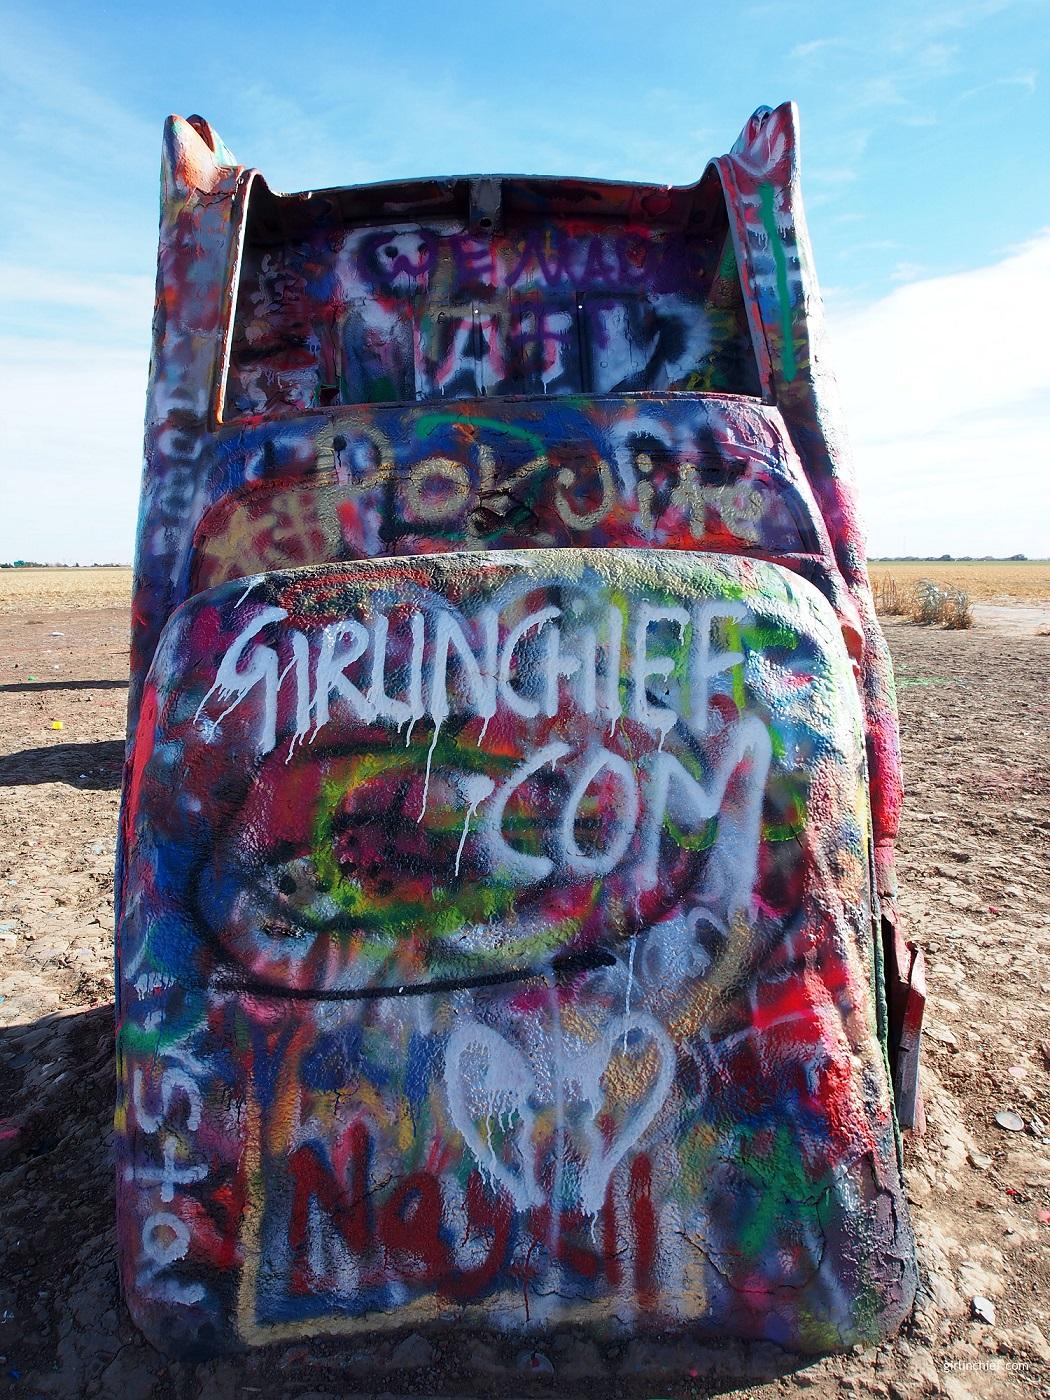 cadillac-ranch-amarillo-texas-girlinchief-4